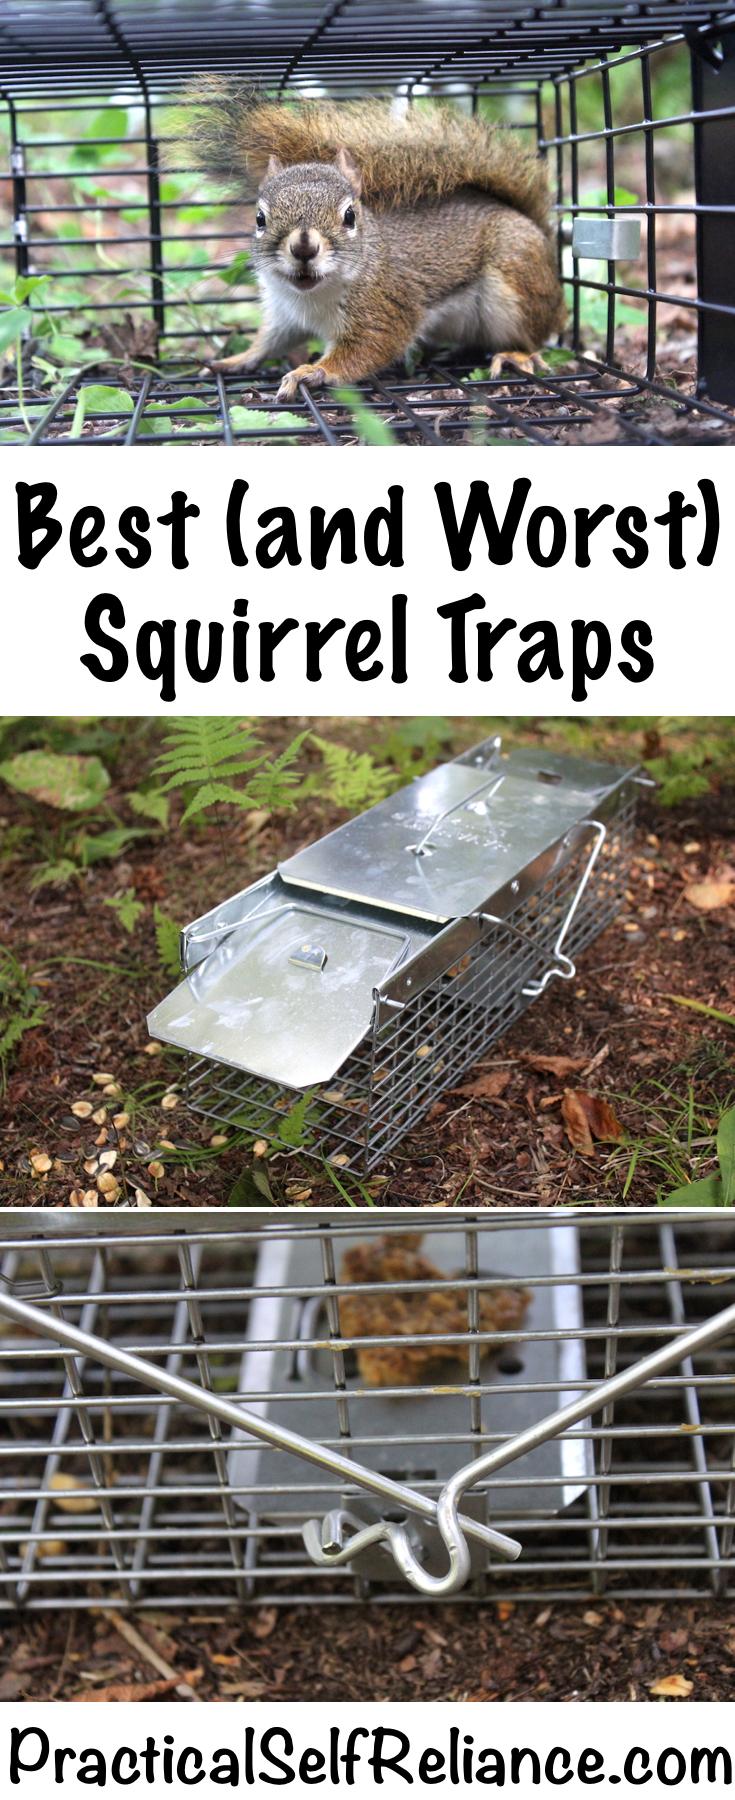 Best Squirrel Traps ~ Best and Worst Squirrel Traps ~ Squirrel Traps that Work #squirrels #gardening #birdwatching #trapping #survival #preparedness #homesteading